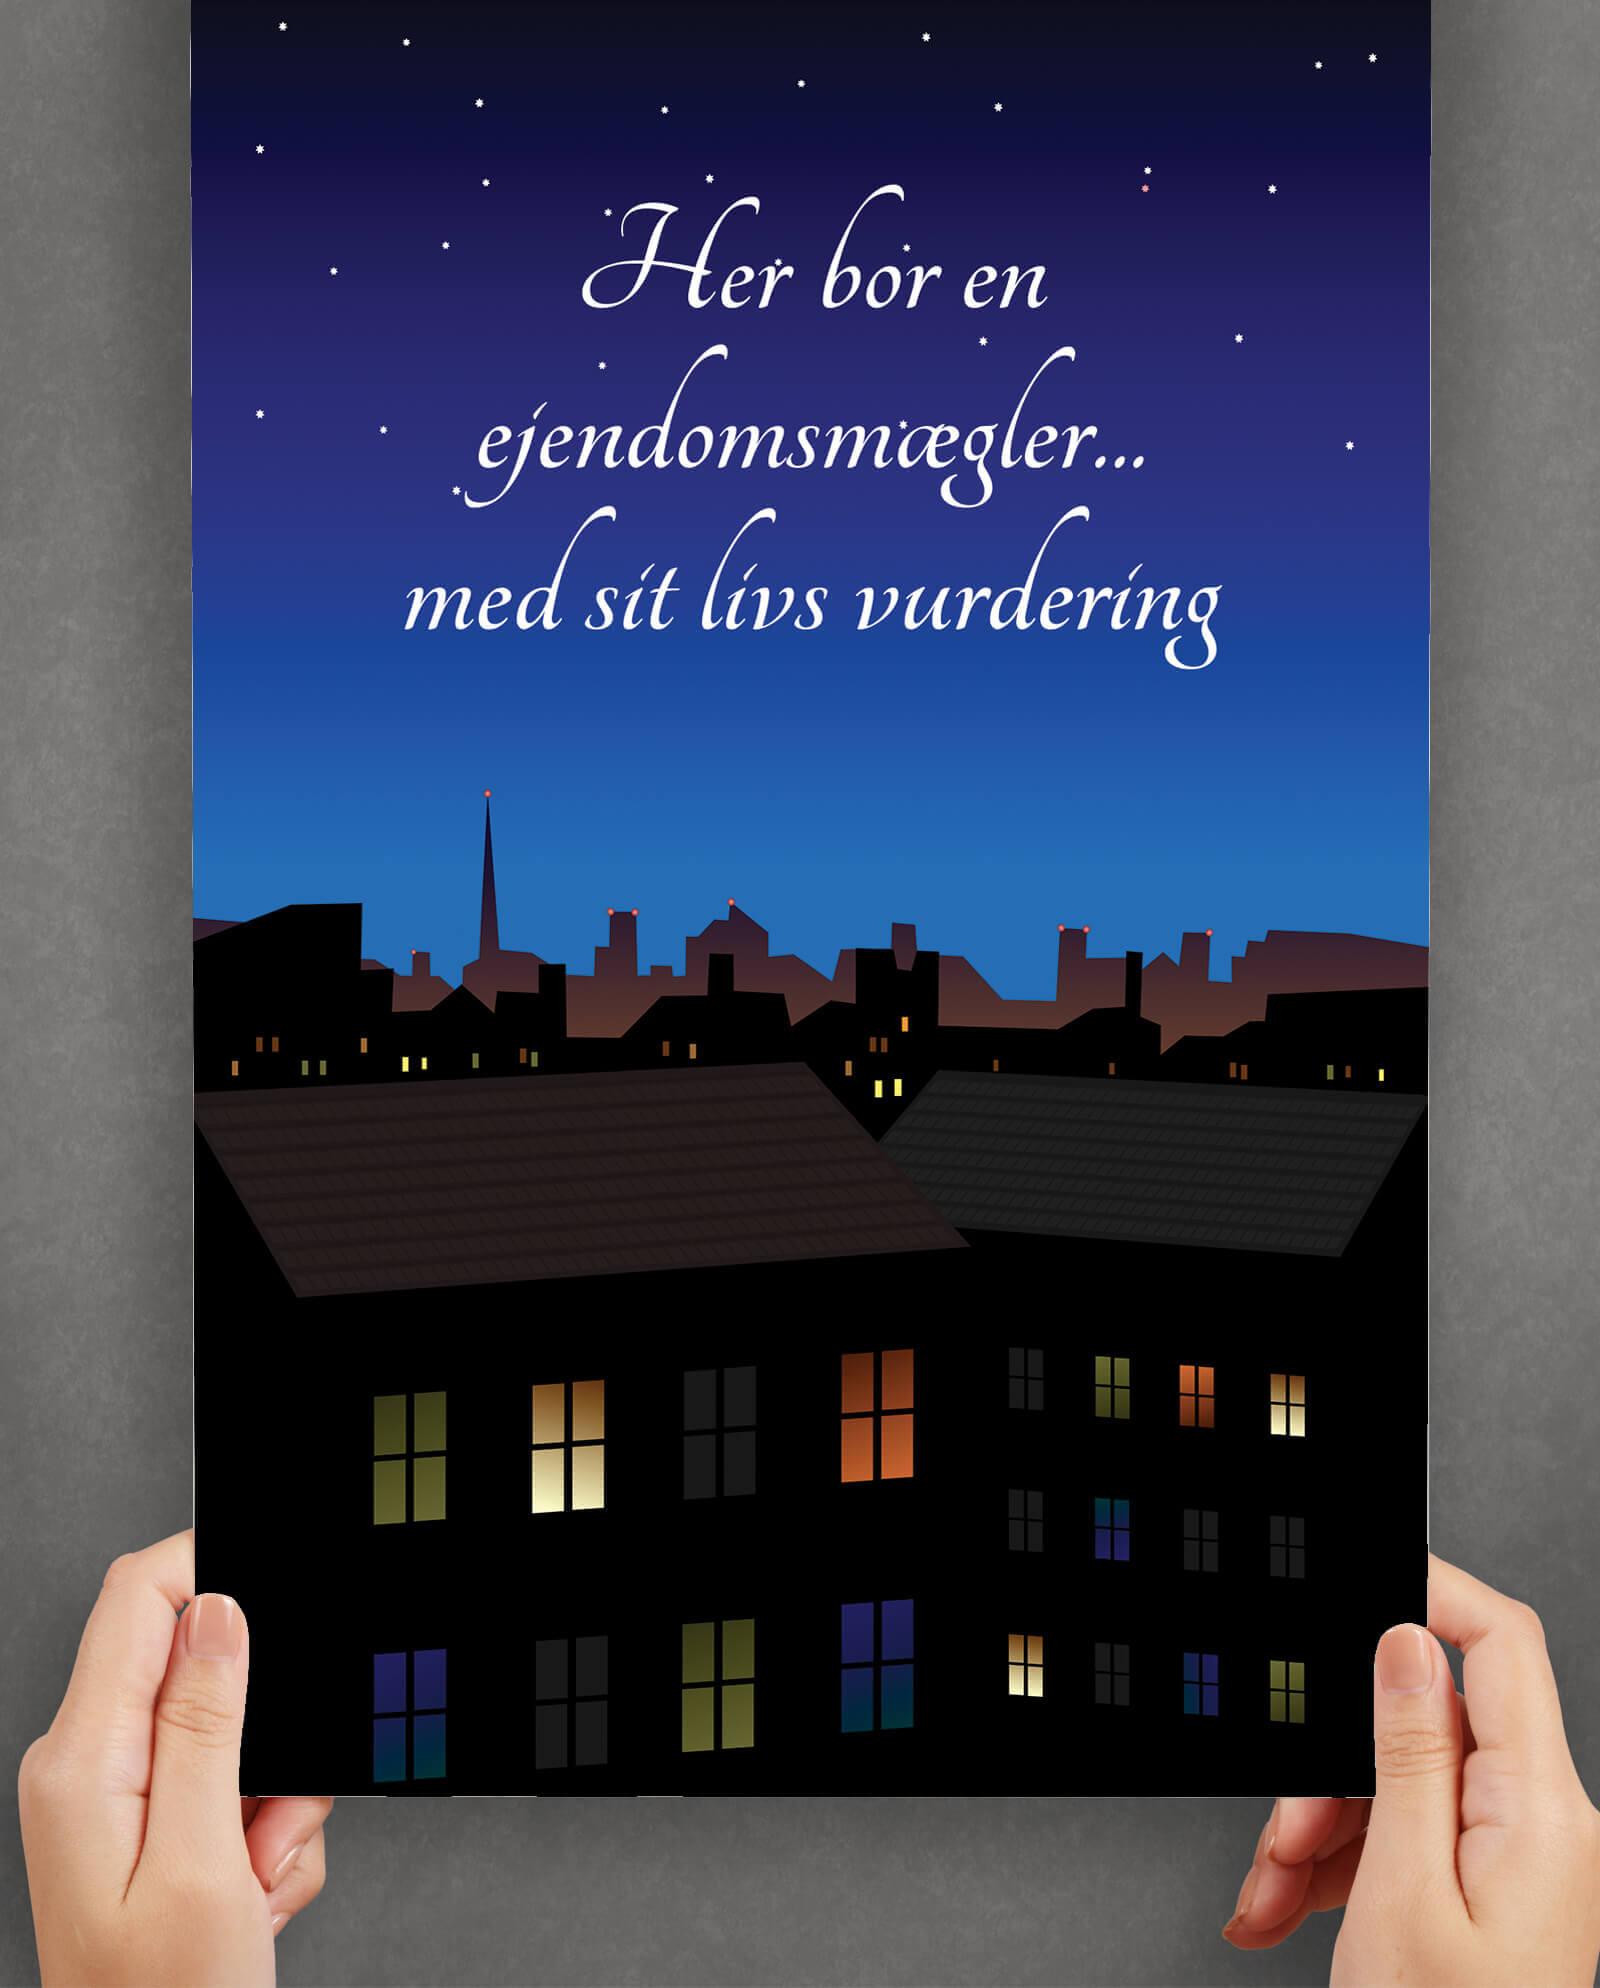 ejendomsmaegler-nat-plakat